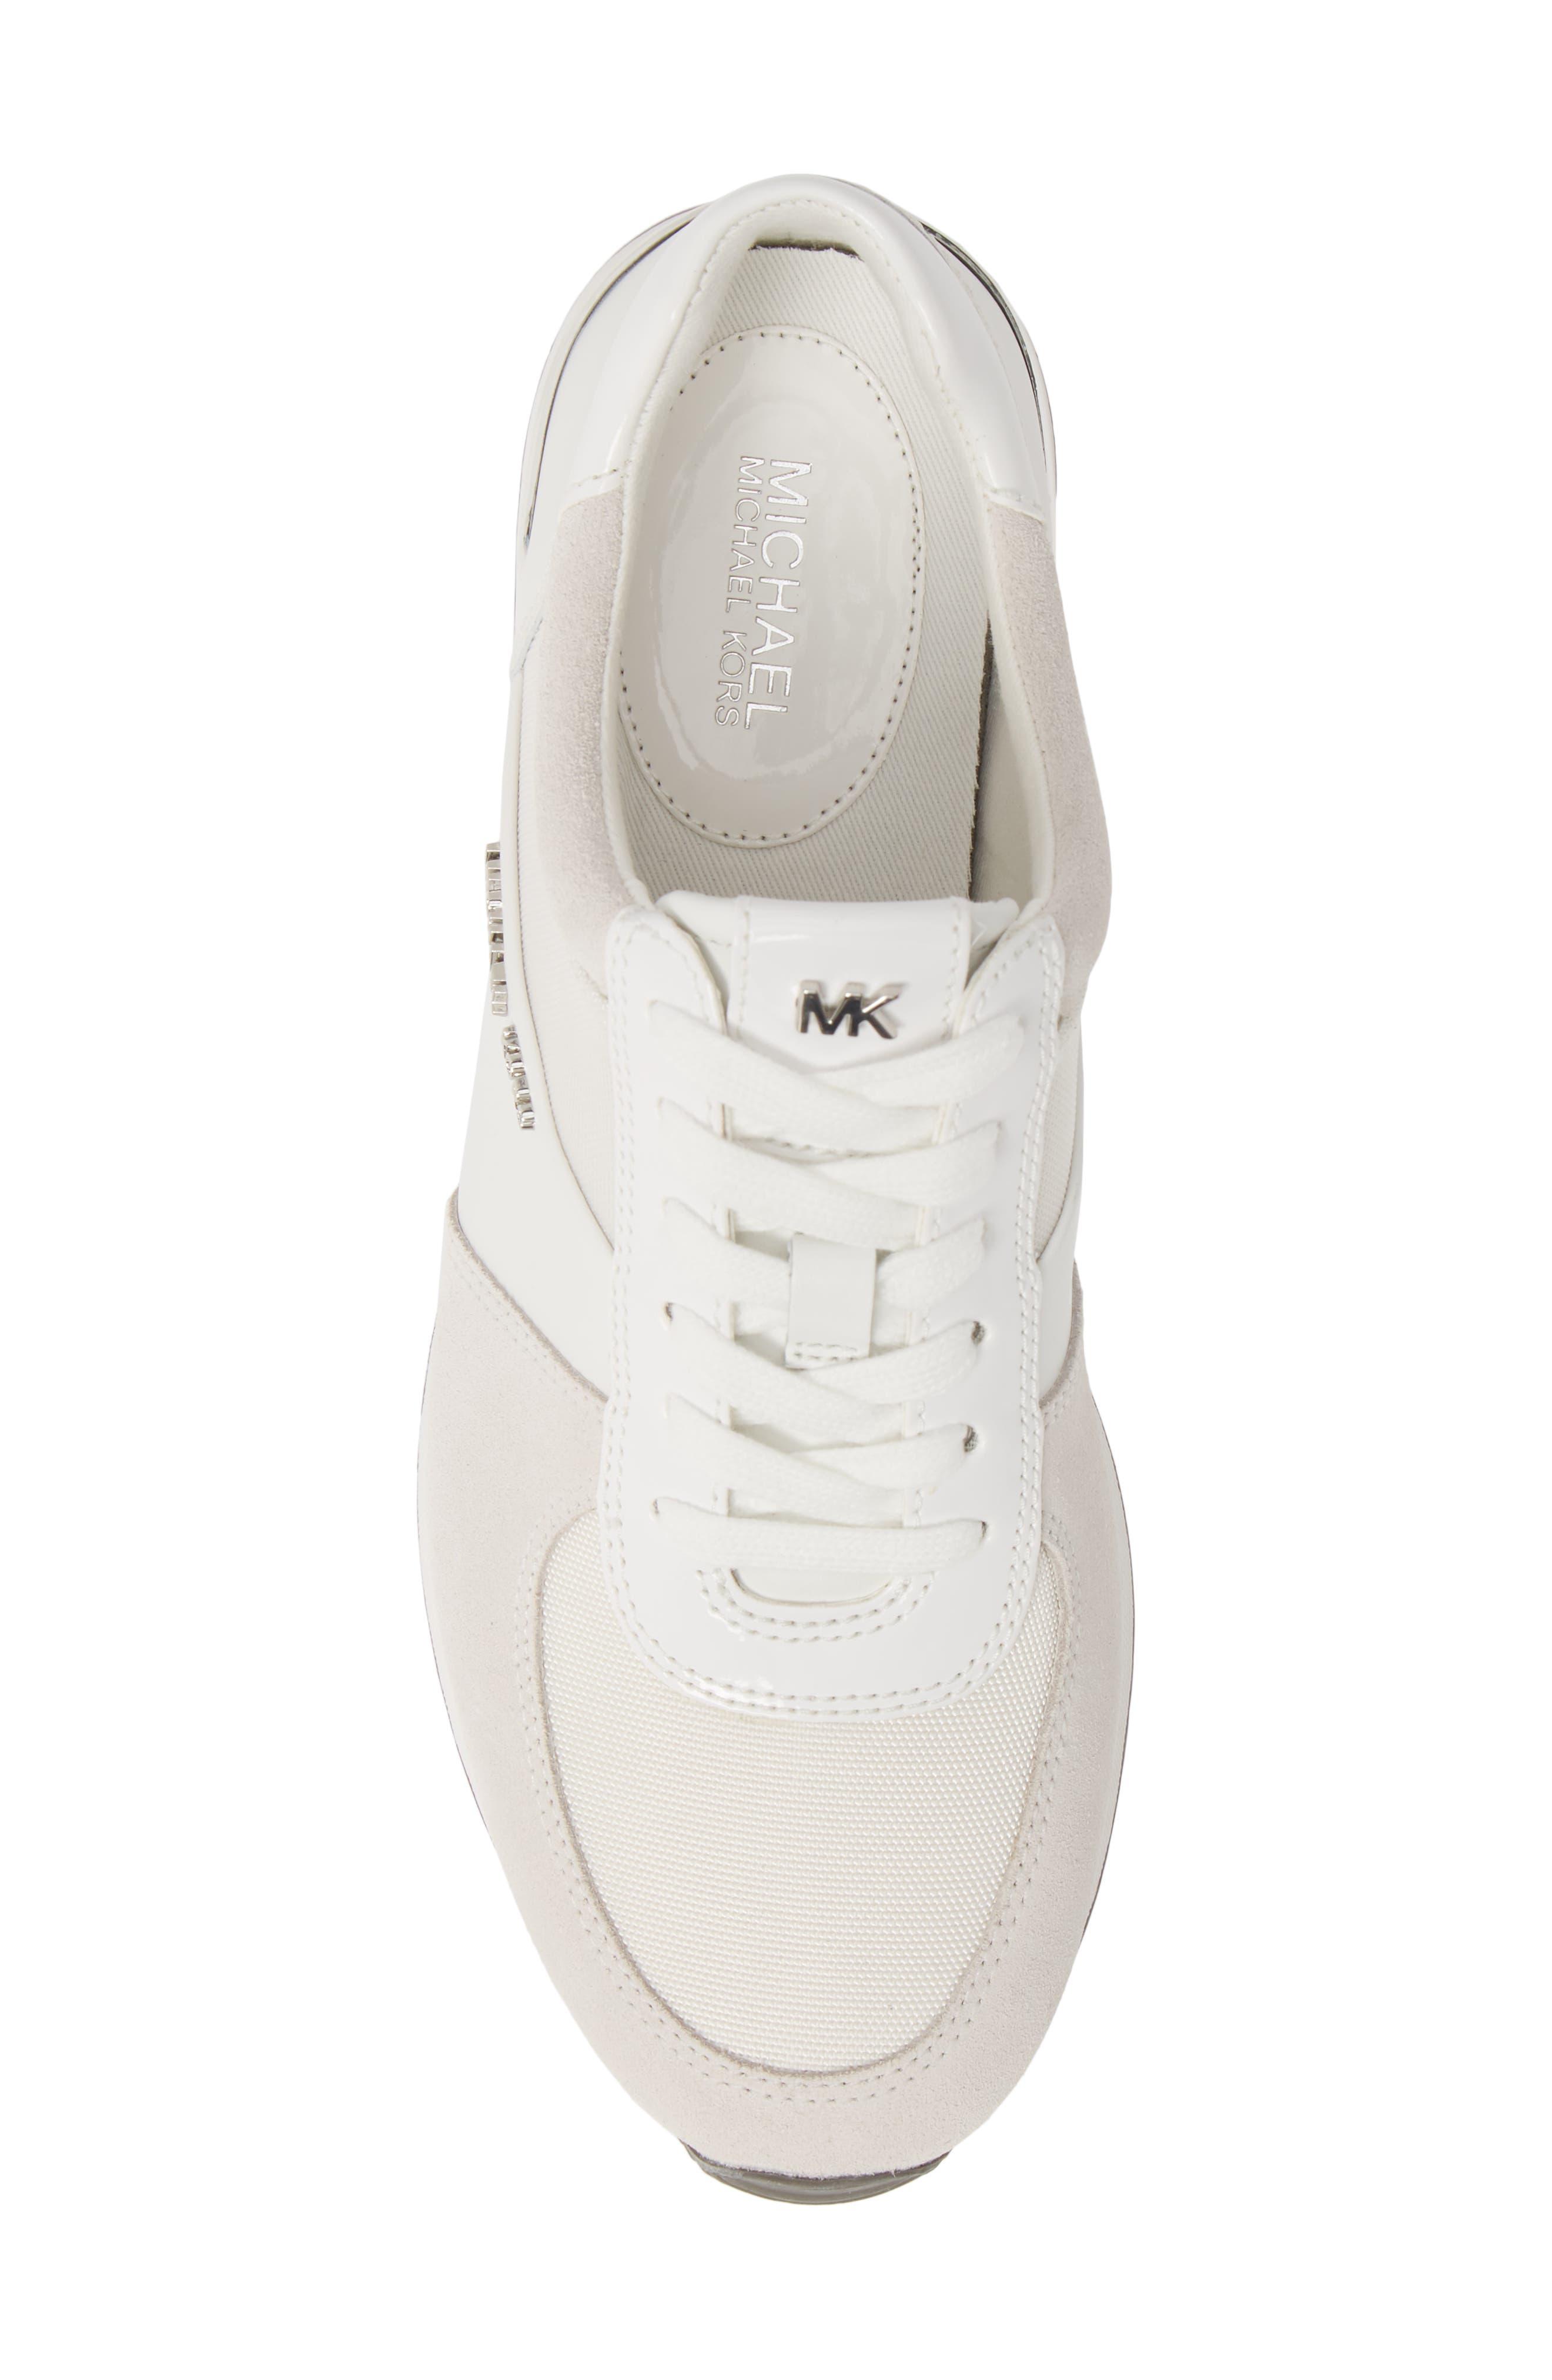 MICHAEL MICHAEL KORS, 'Allie' Sneaker, Alternate thumbnail 5, color, OPTIC WHITE LEATHER/ CANVAS